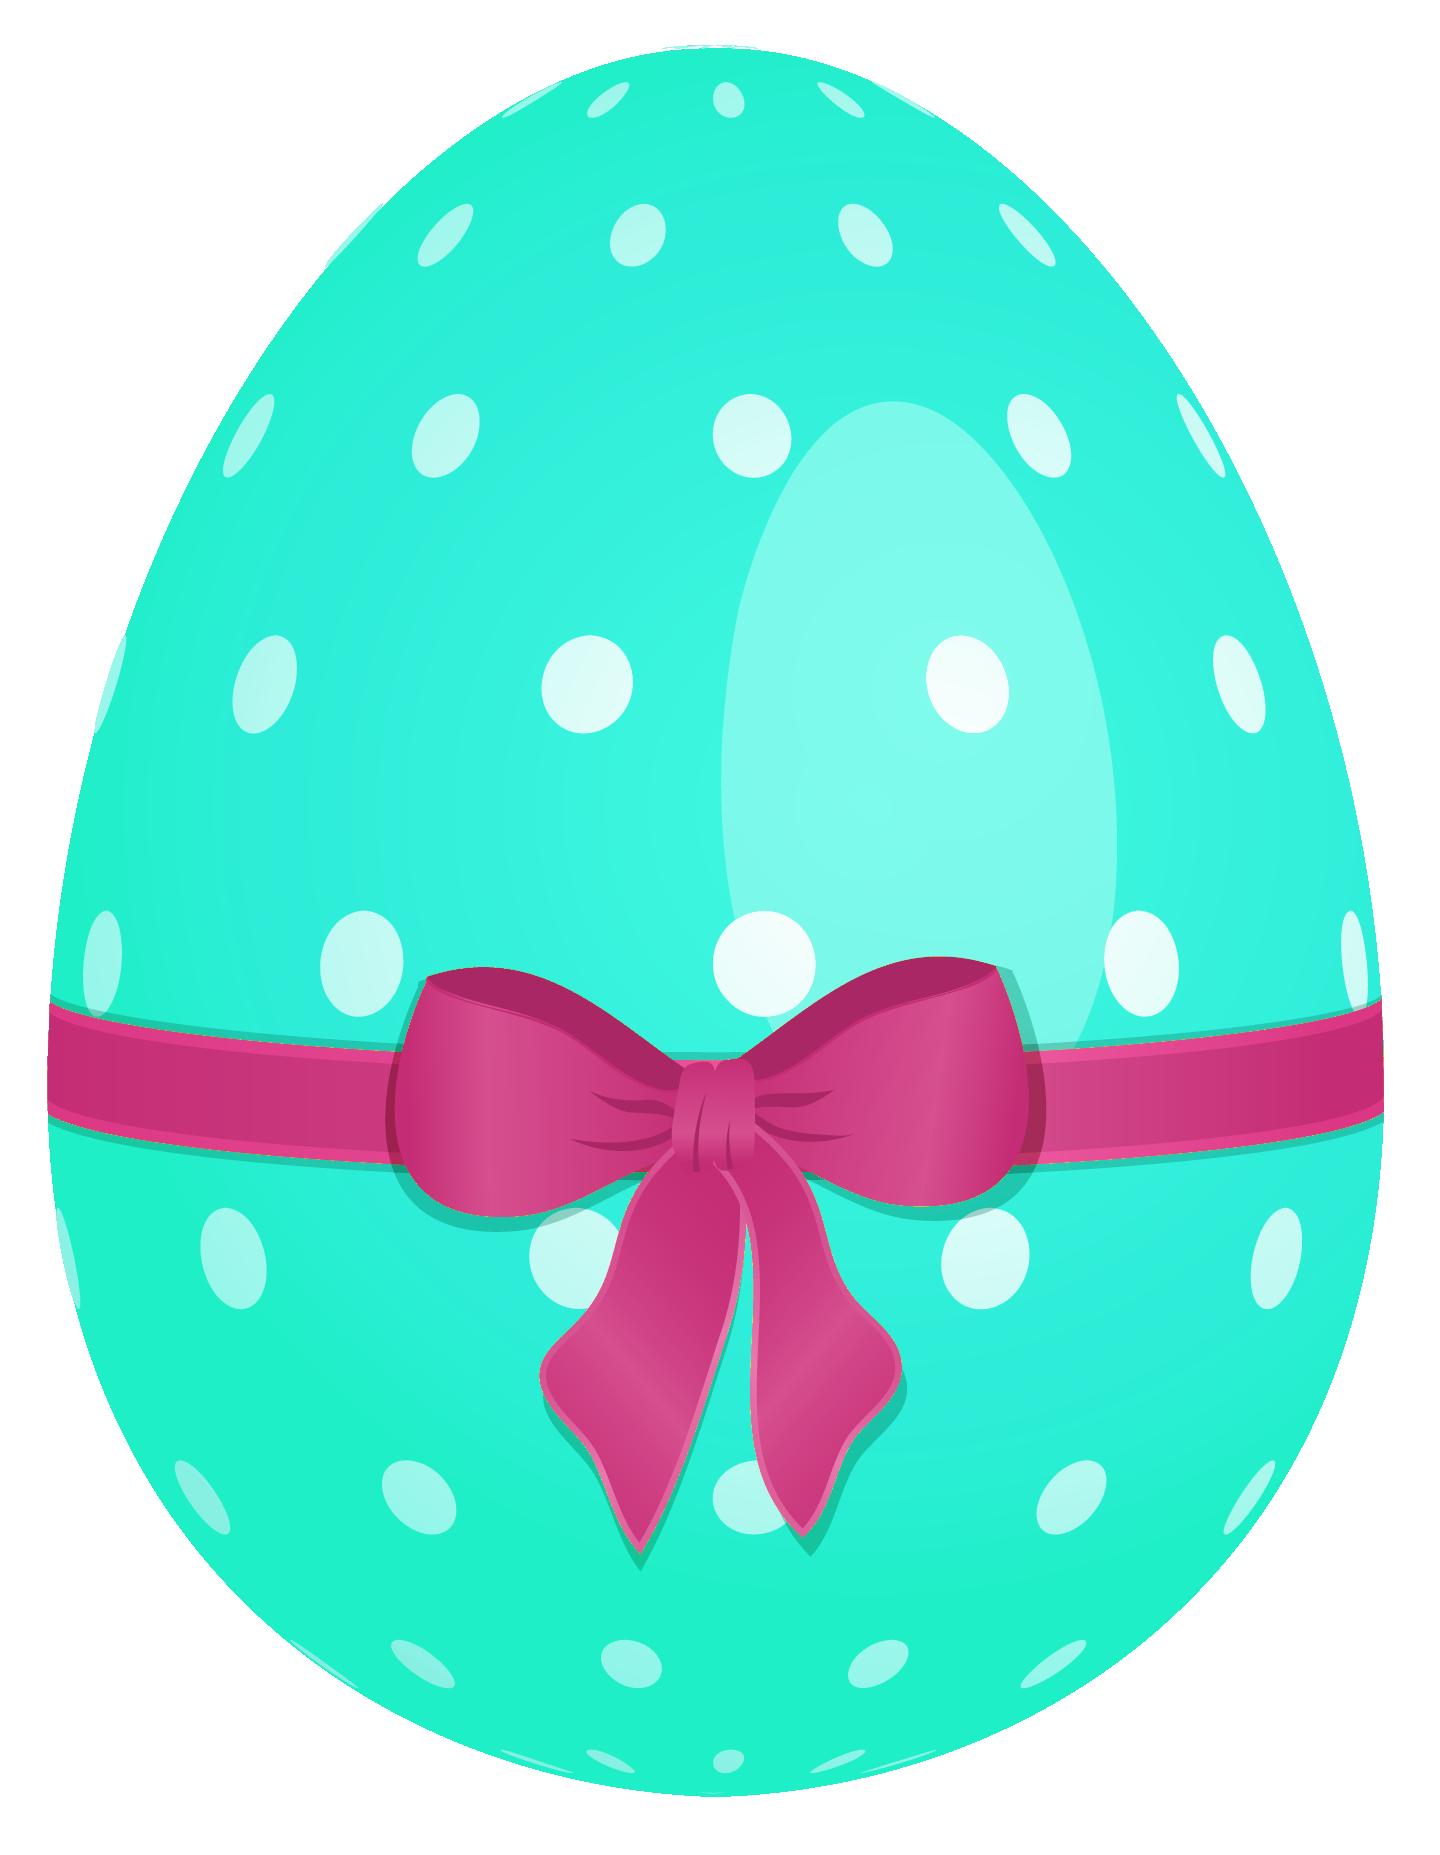 Easter Egg Clipart & Easter Egg Clip Art Images.